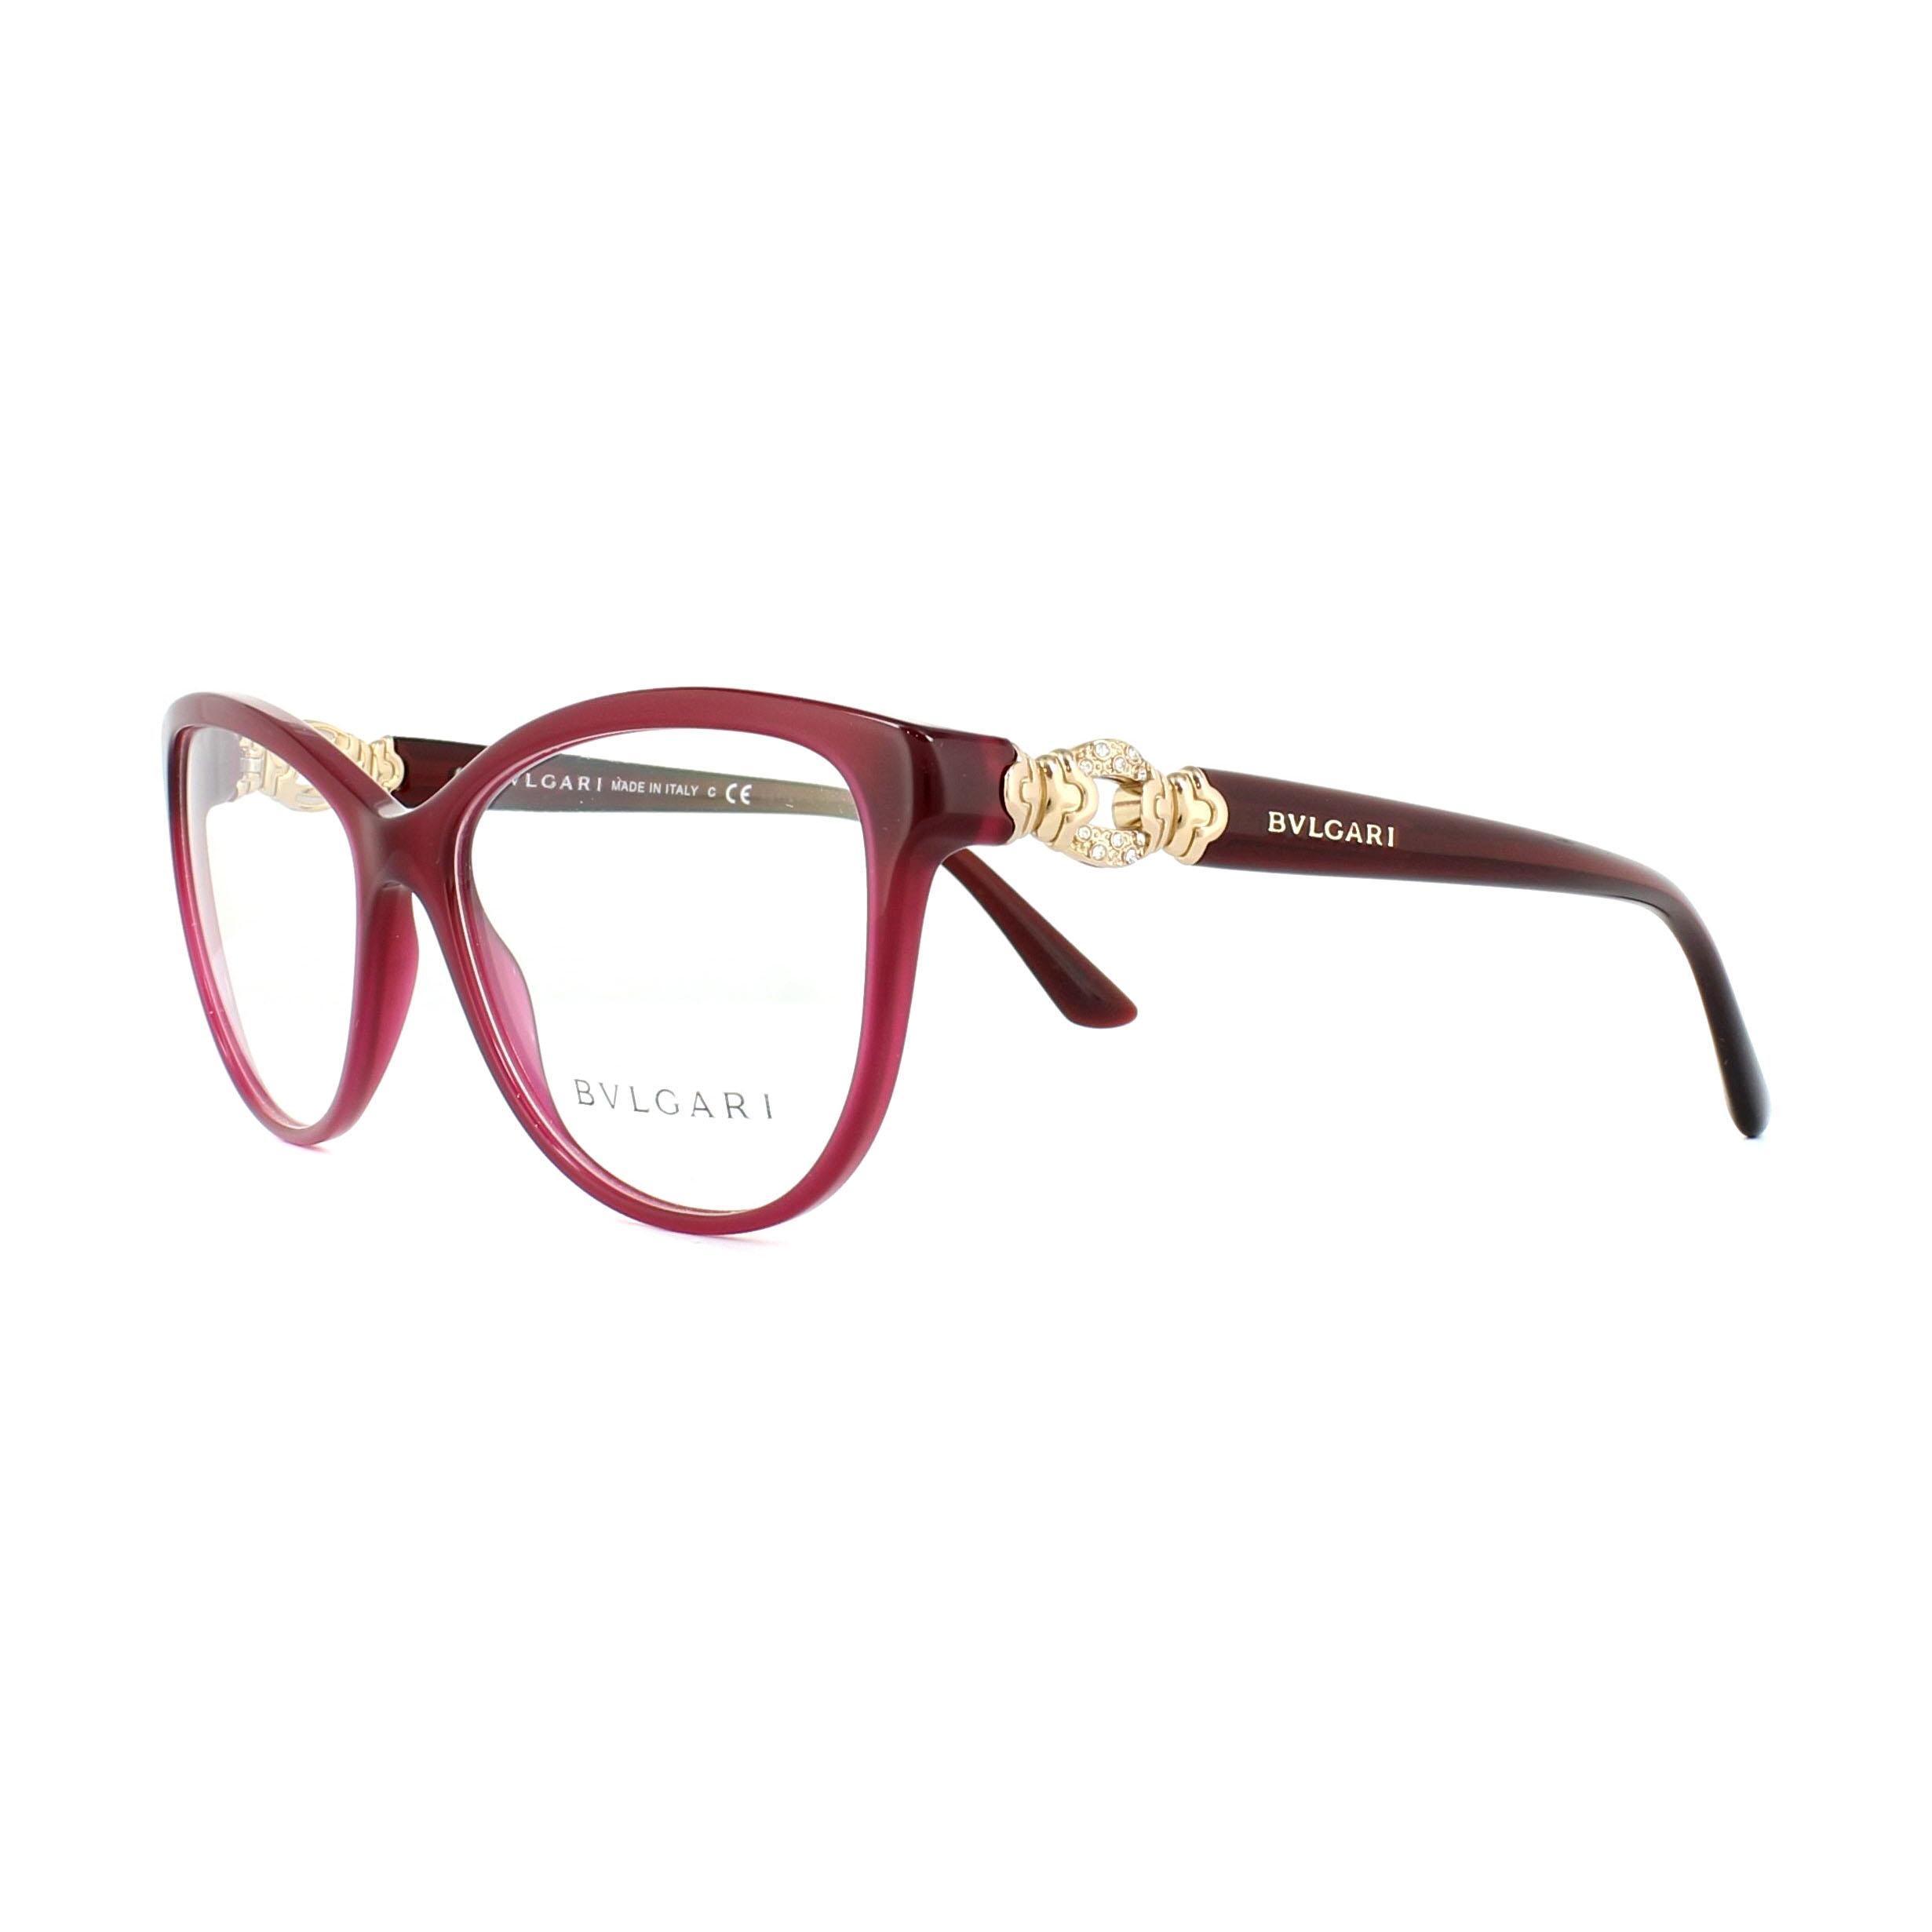 Bvlgari Glasses Frames 4132B 5333 Red 55mm Womens 8053672639780 | eBay